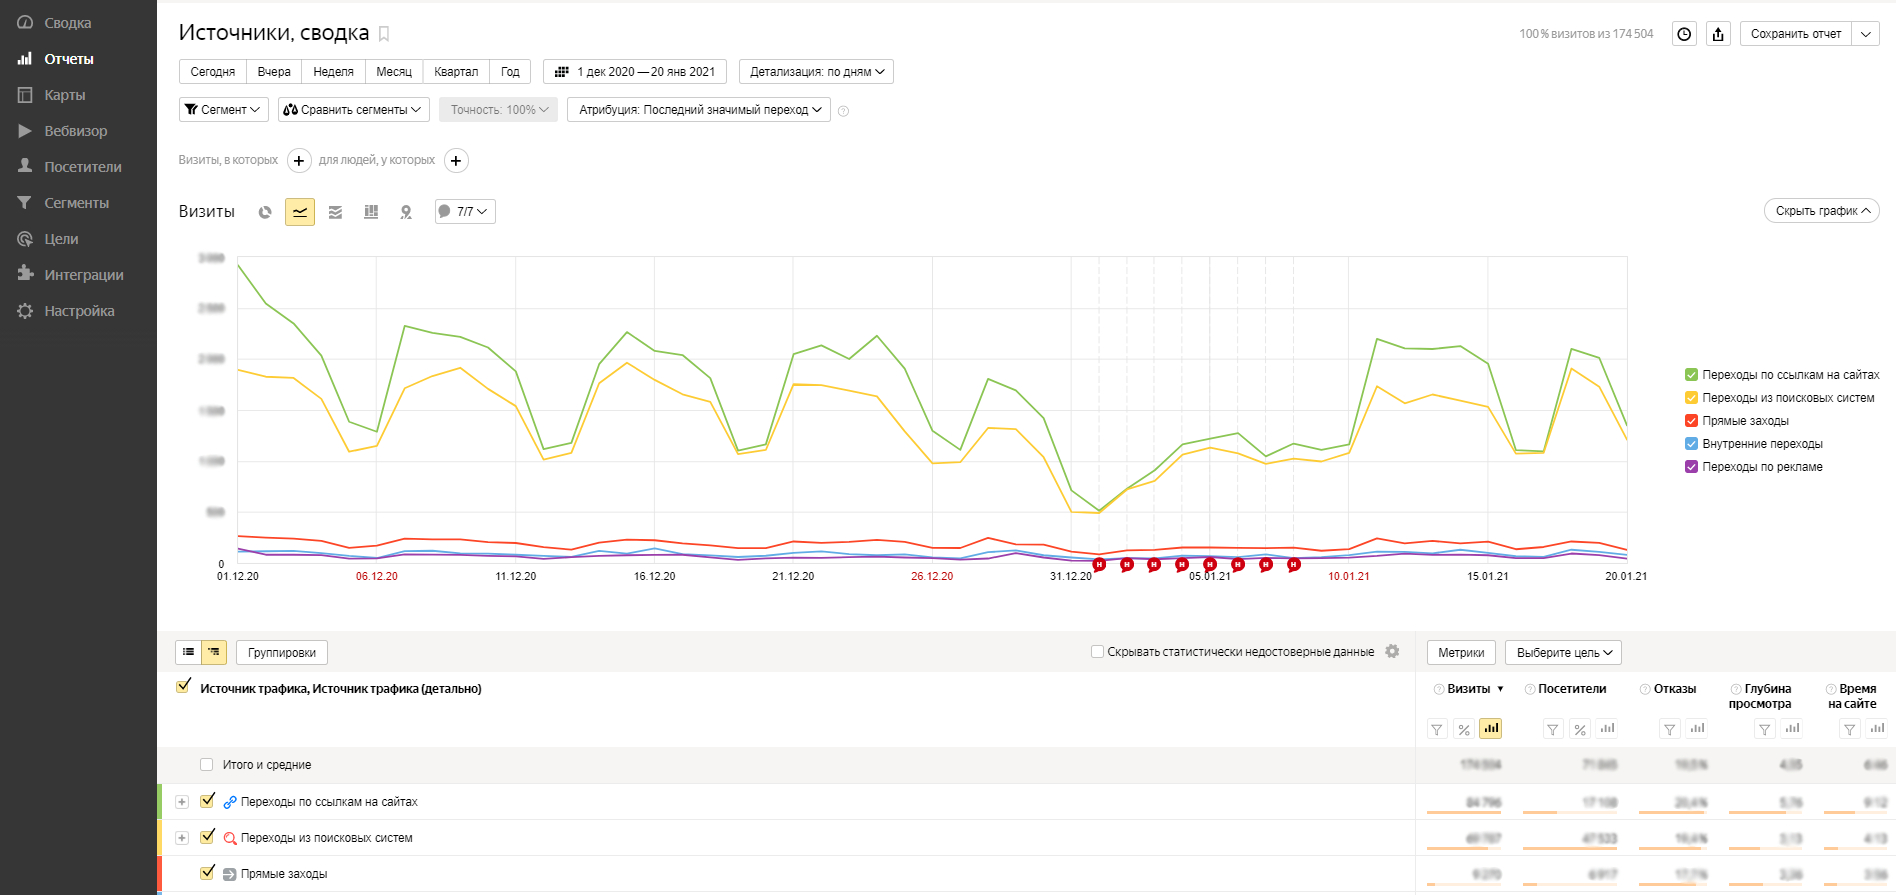 Анализ источников трафика в Яндекс.Метрике